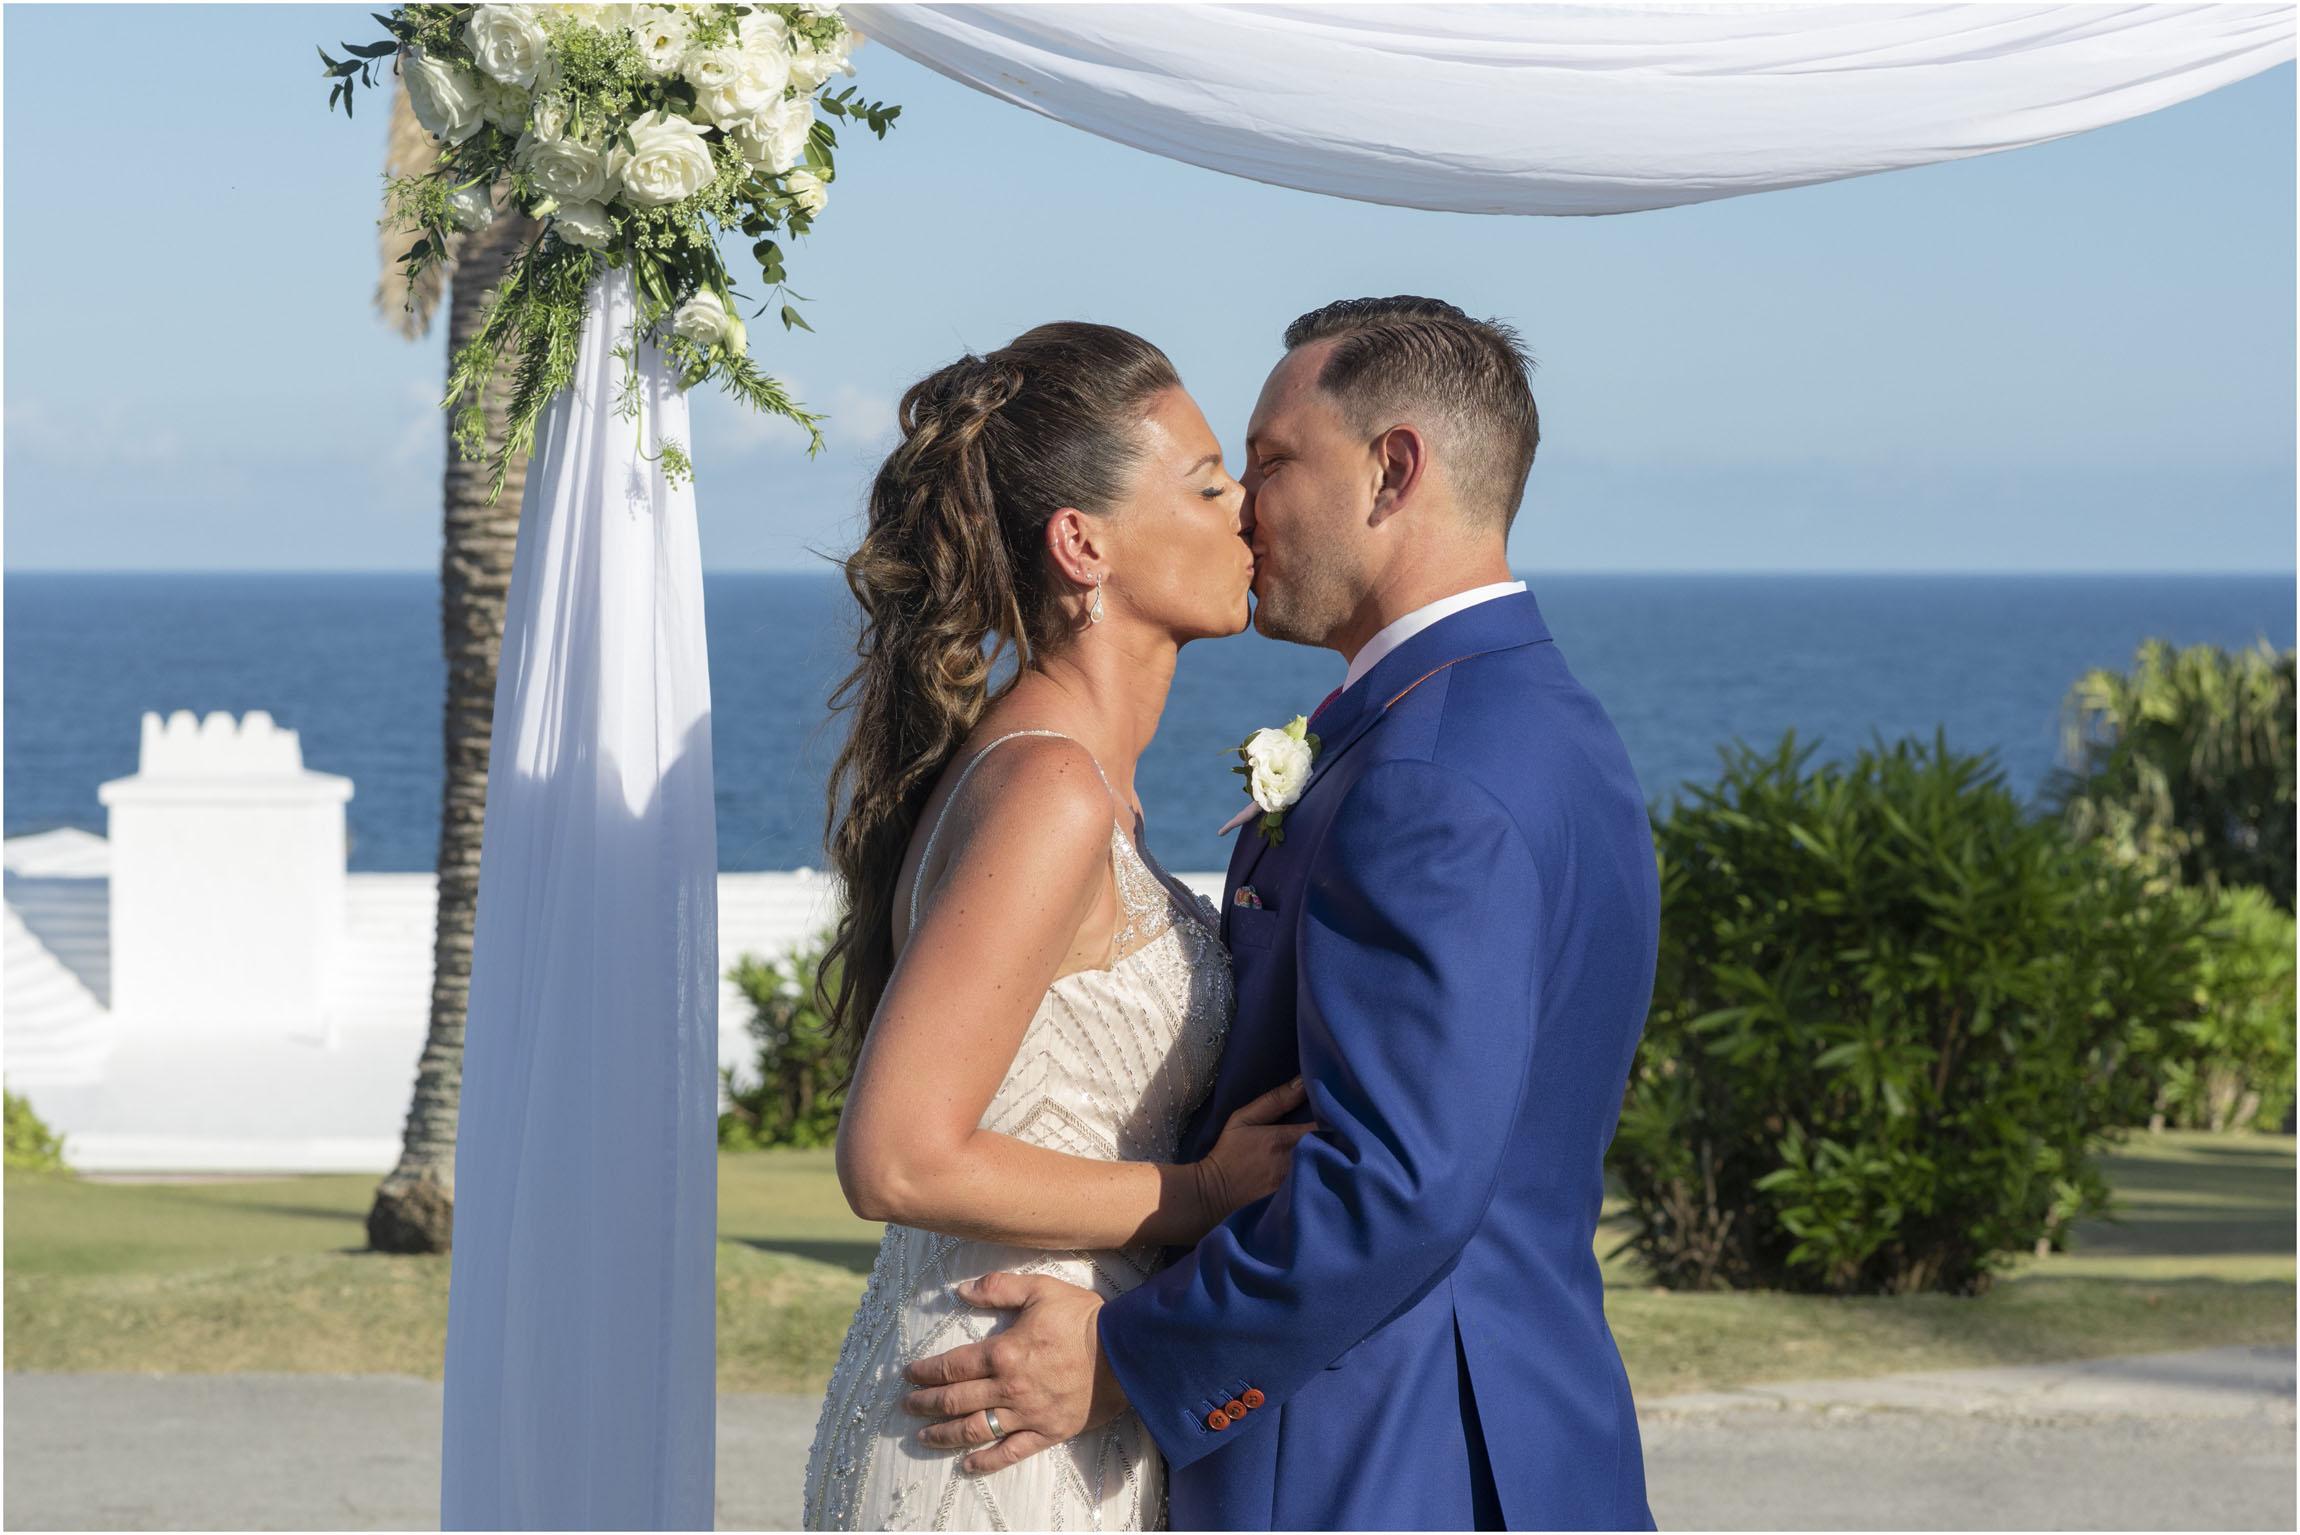 ©FianderFoto_Catherine_Kenny_Coral+Beach+Wedding_167.jpg